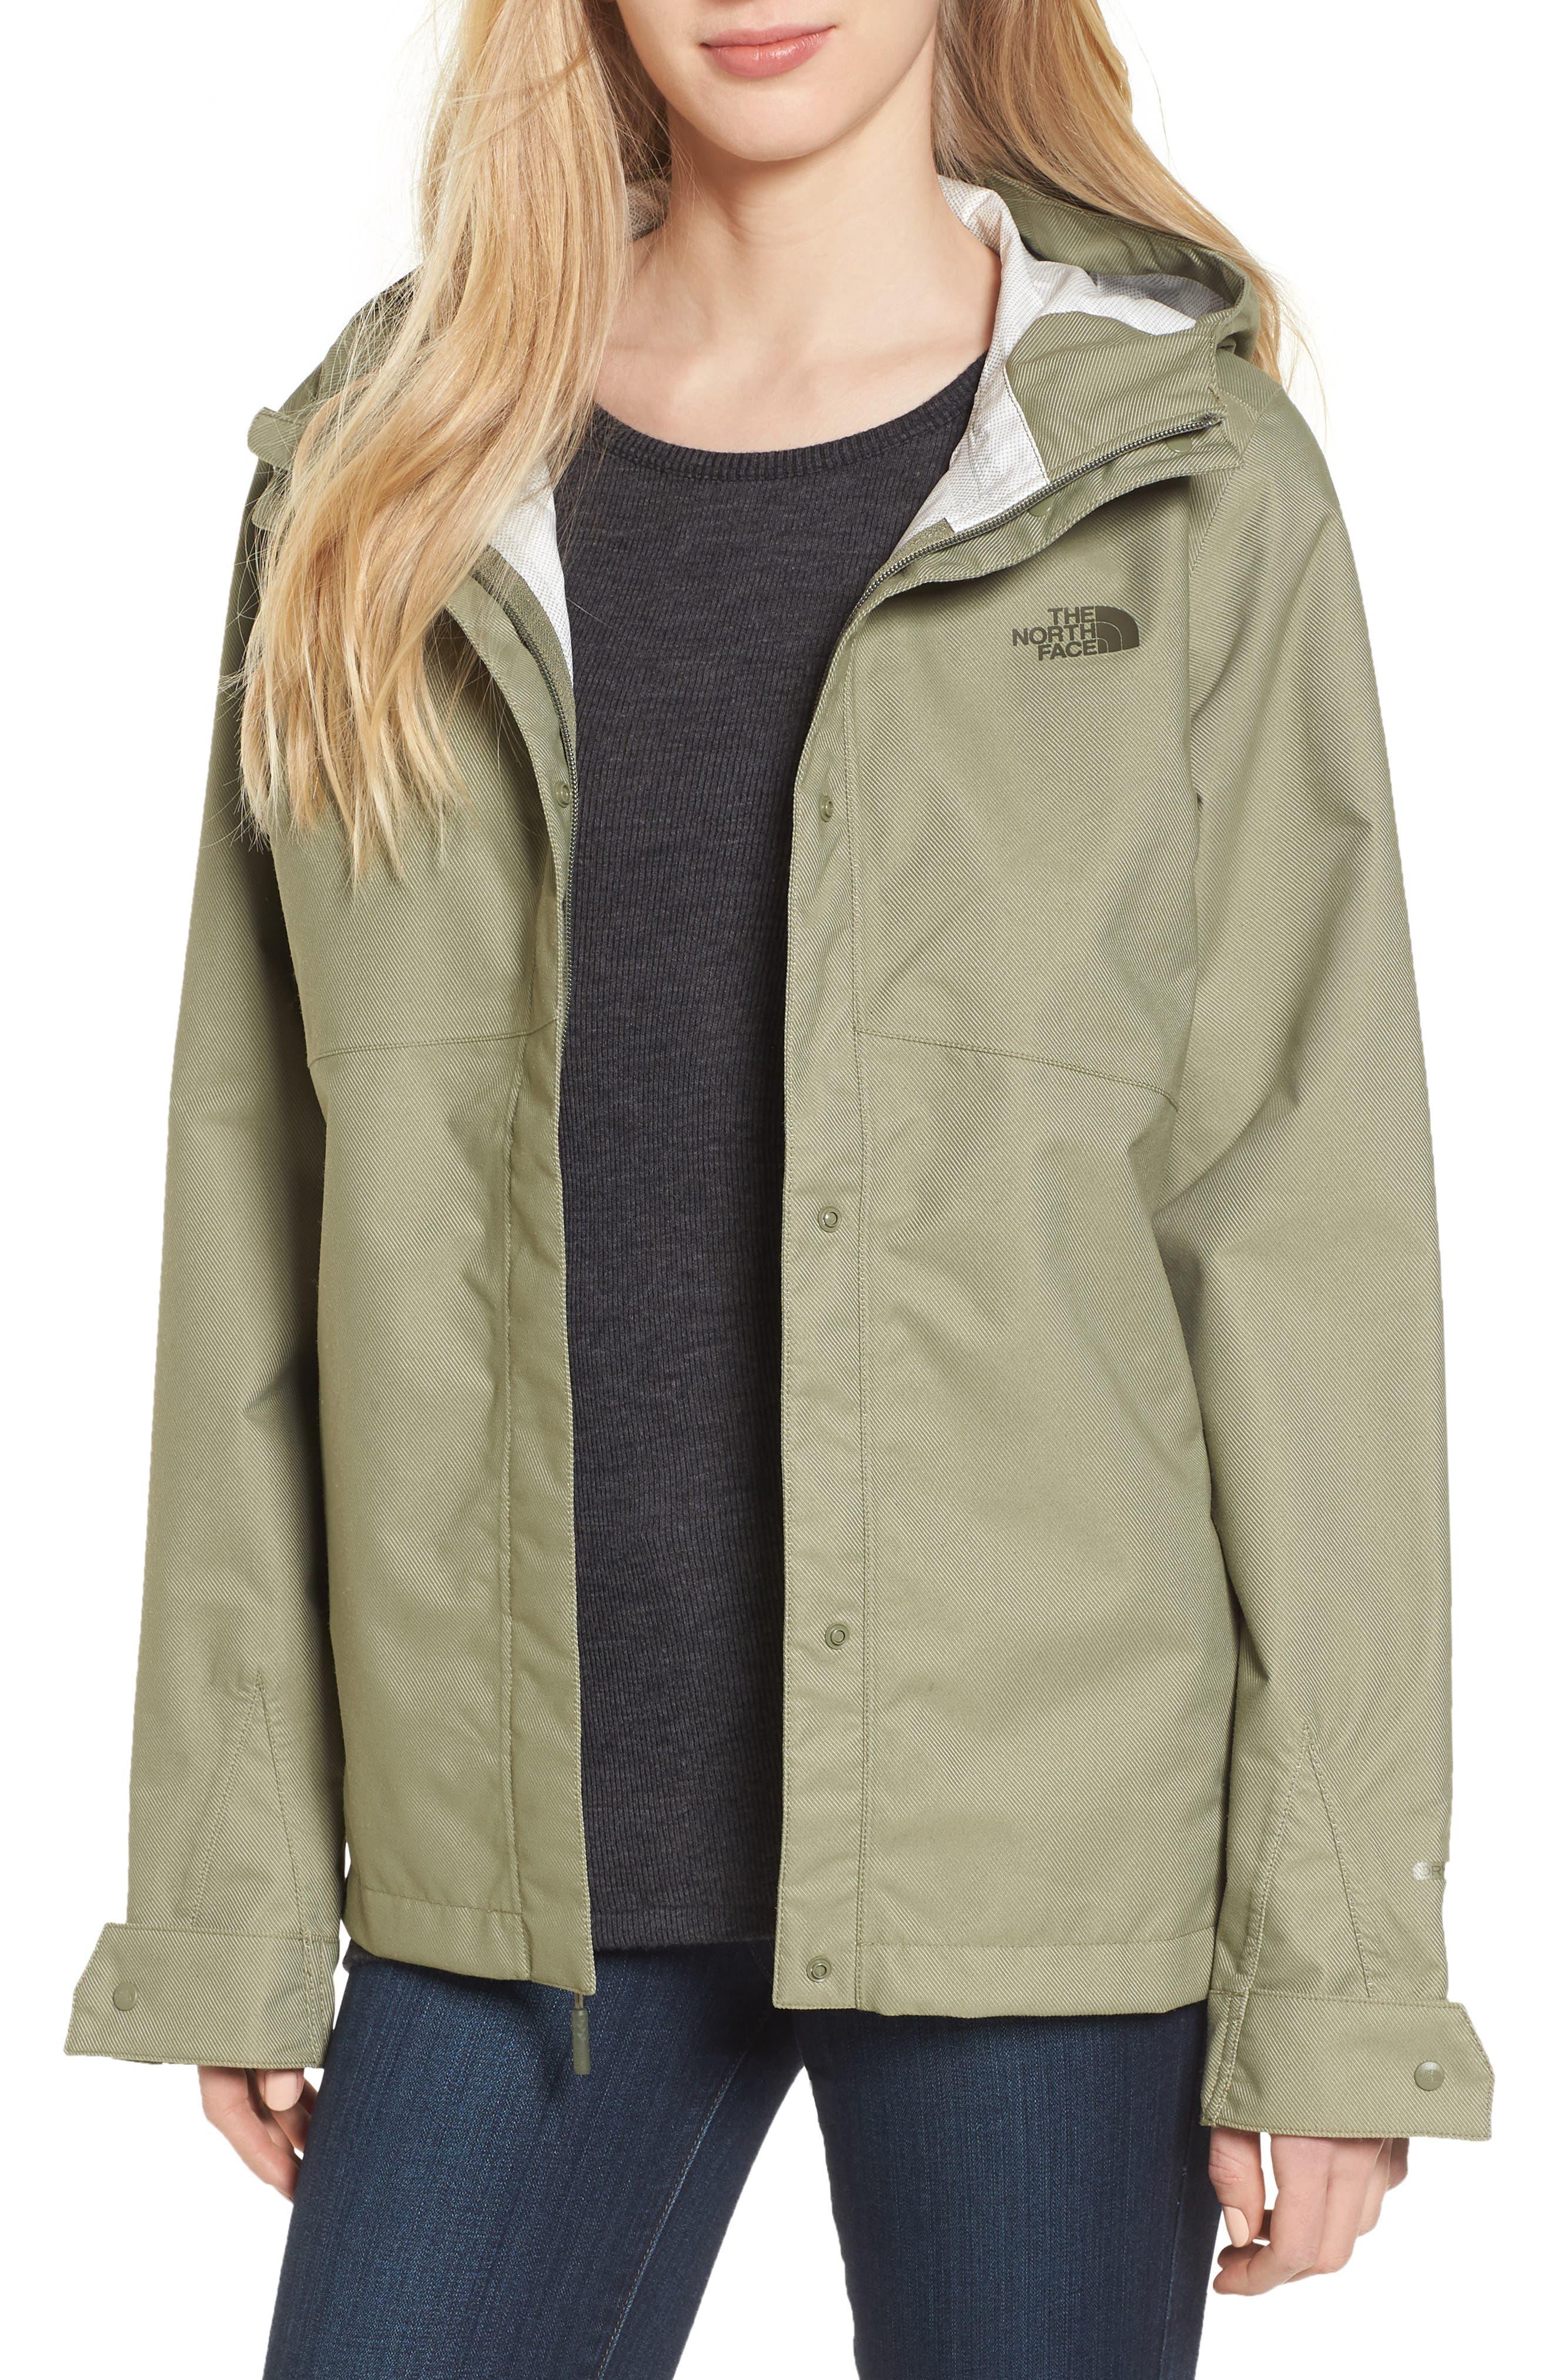 Berrien Waterproof Jacket,                             Main thumbnail 1, color,                             Deep Lichen Green Denim